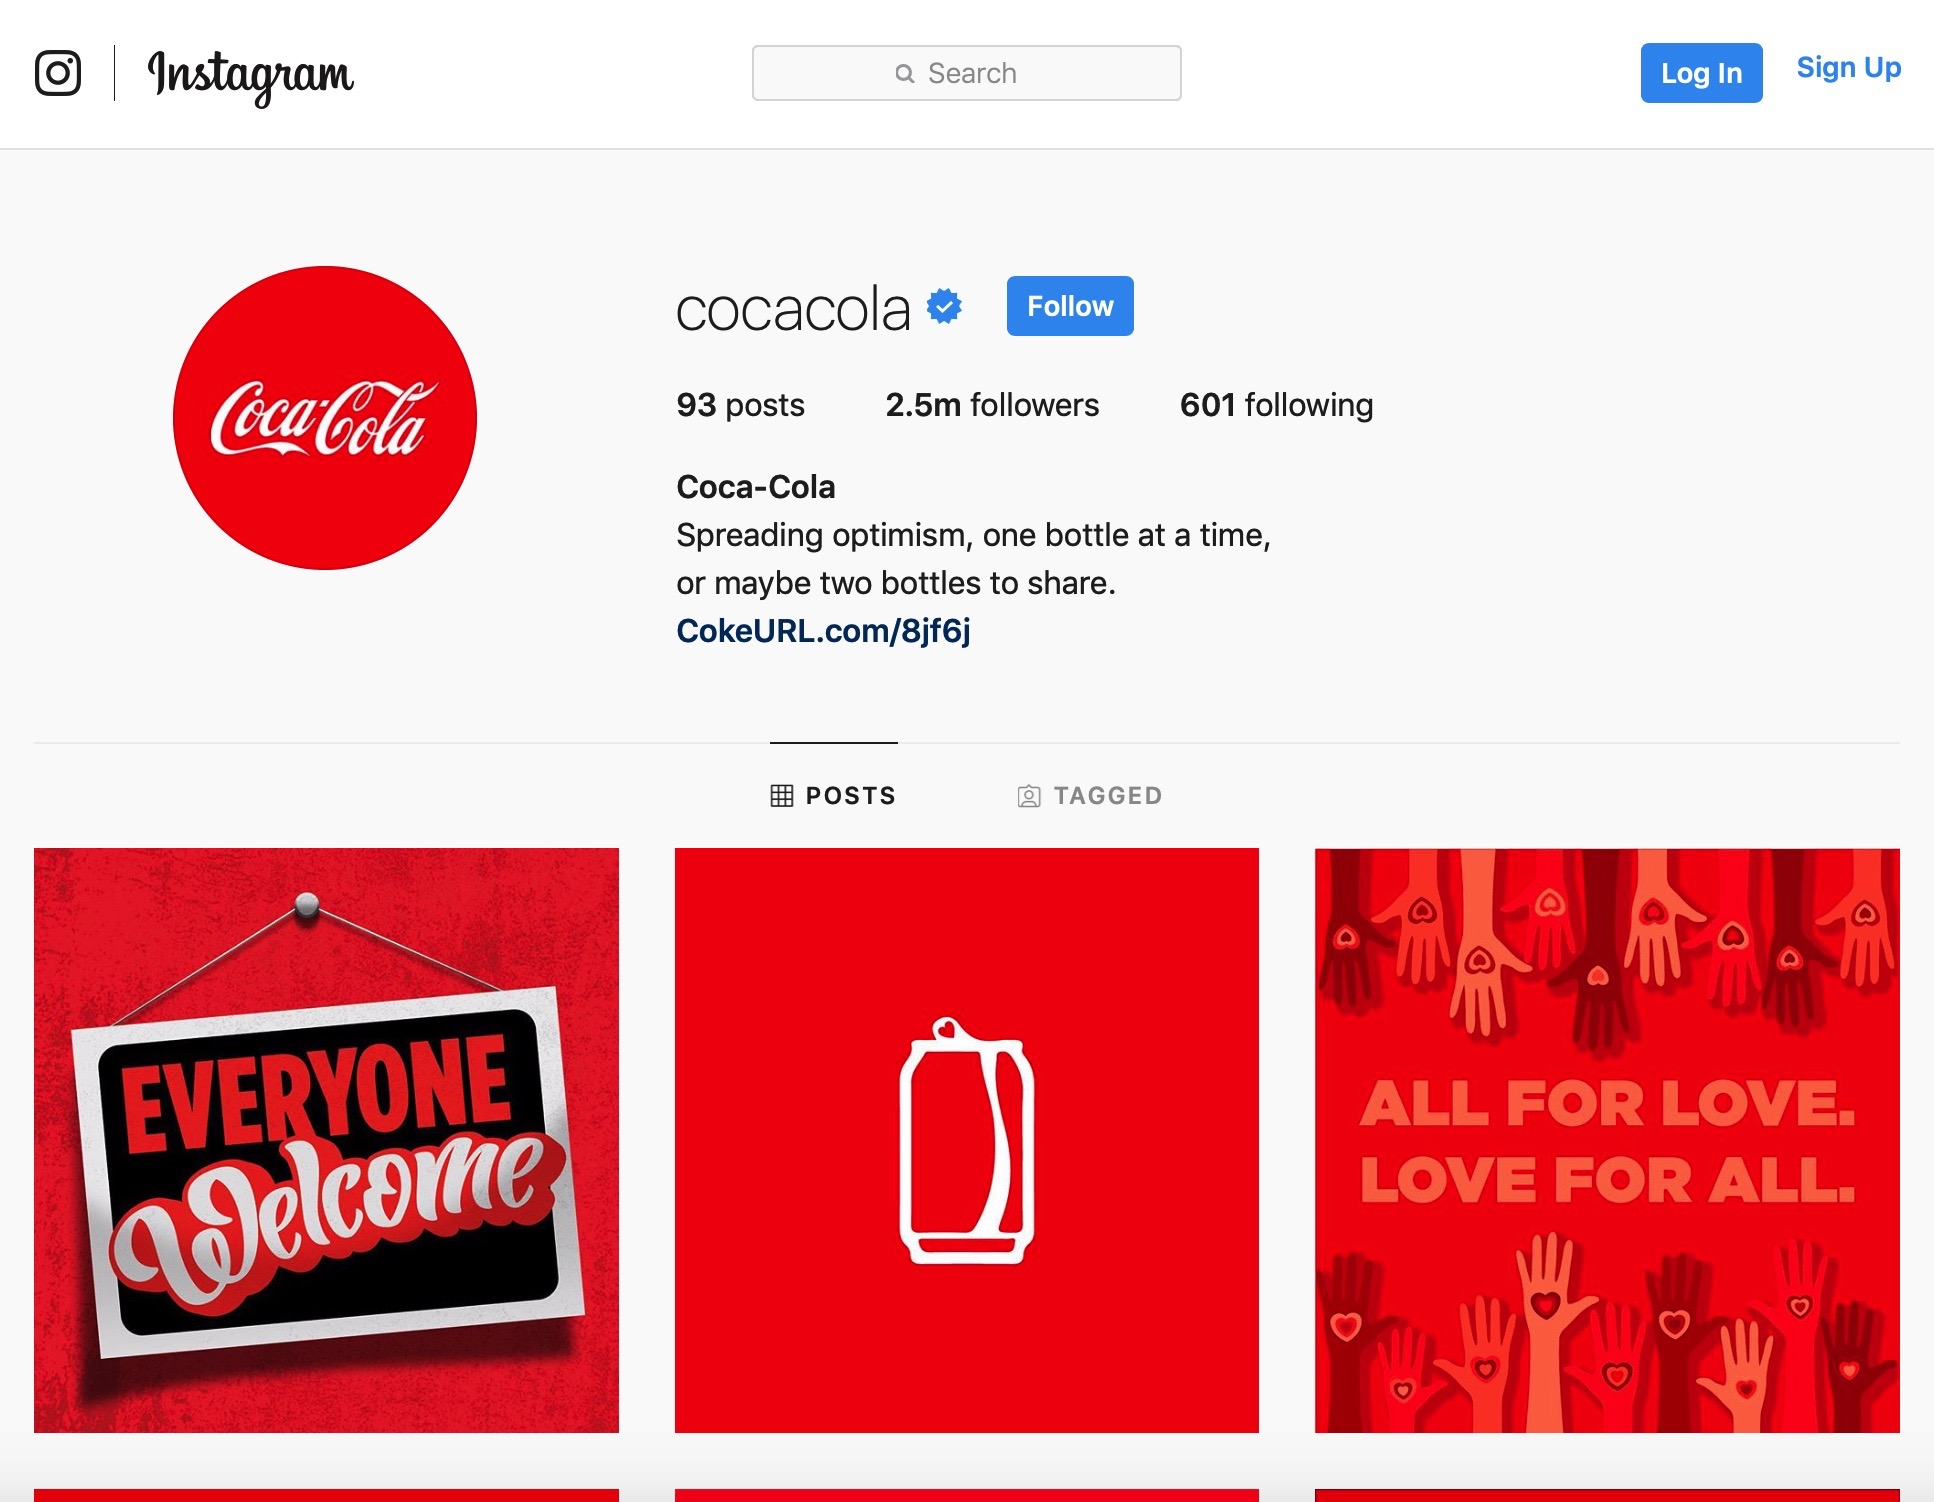 Image result for coca cola instagram page